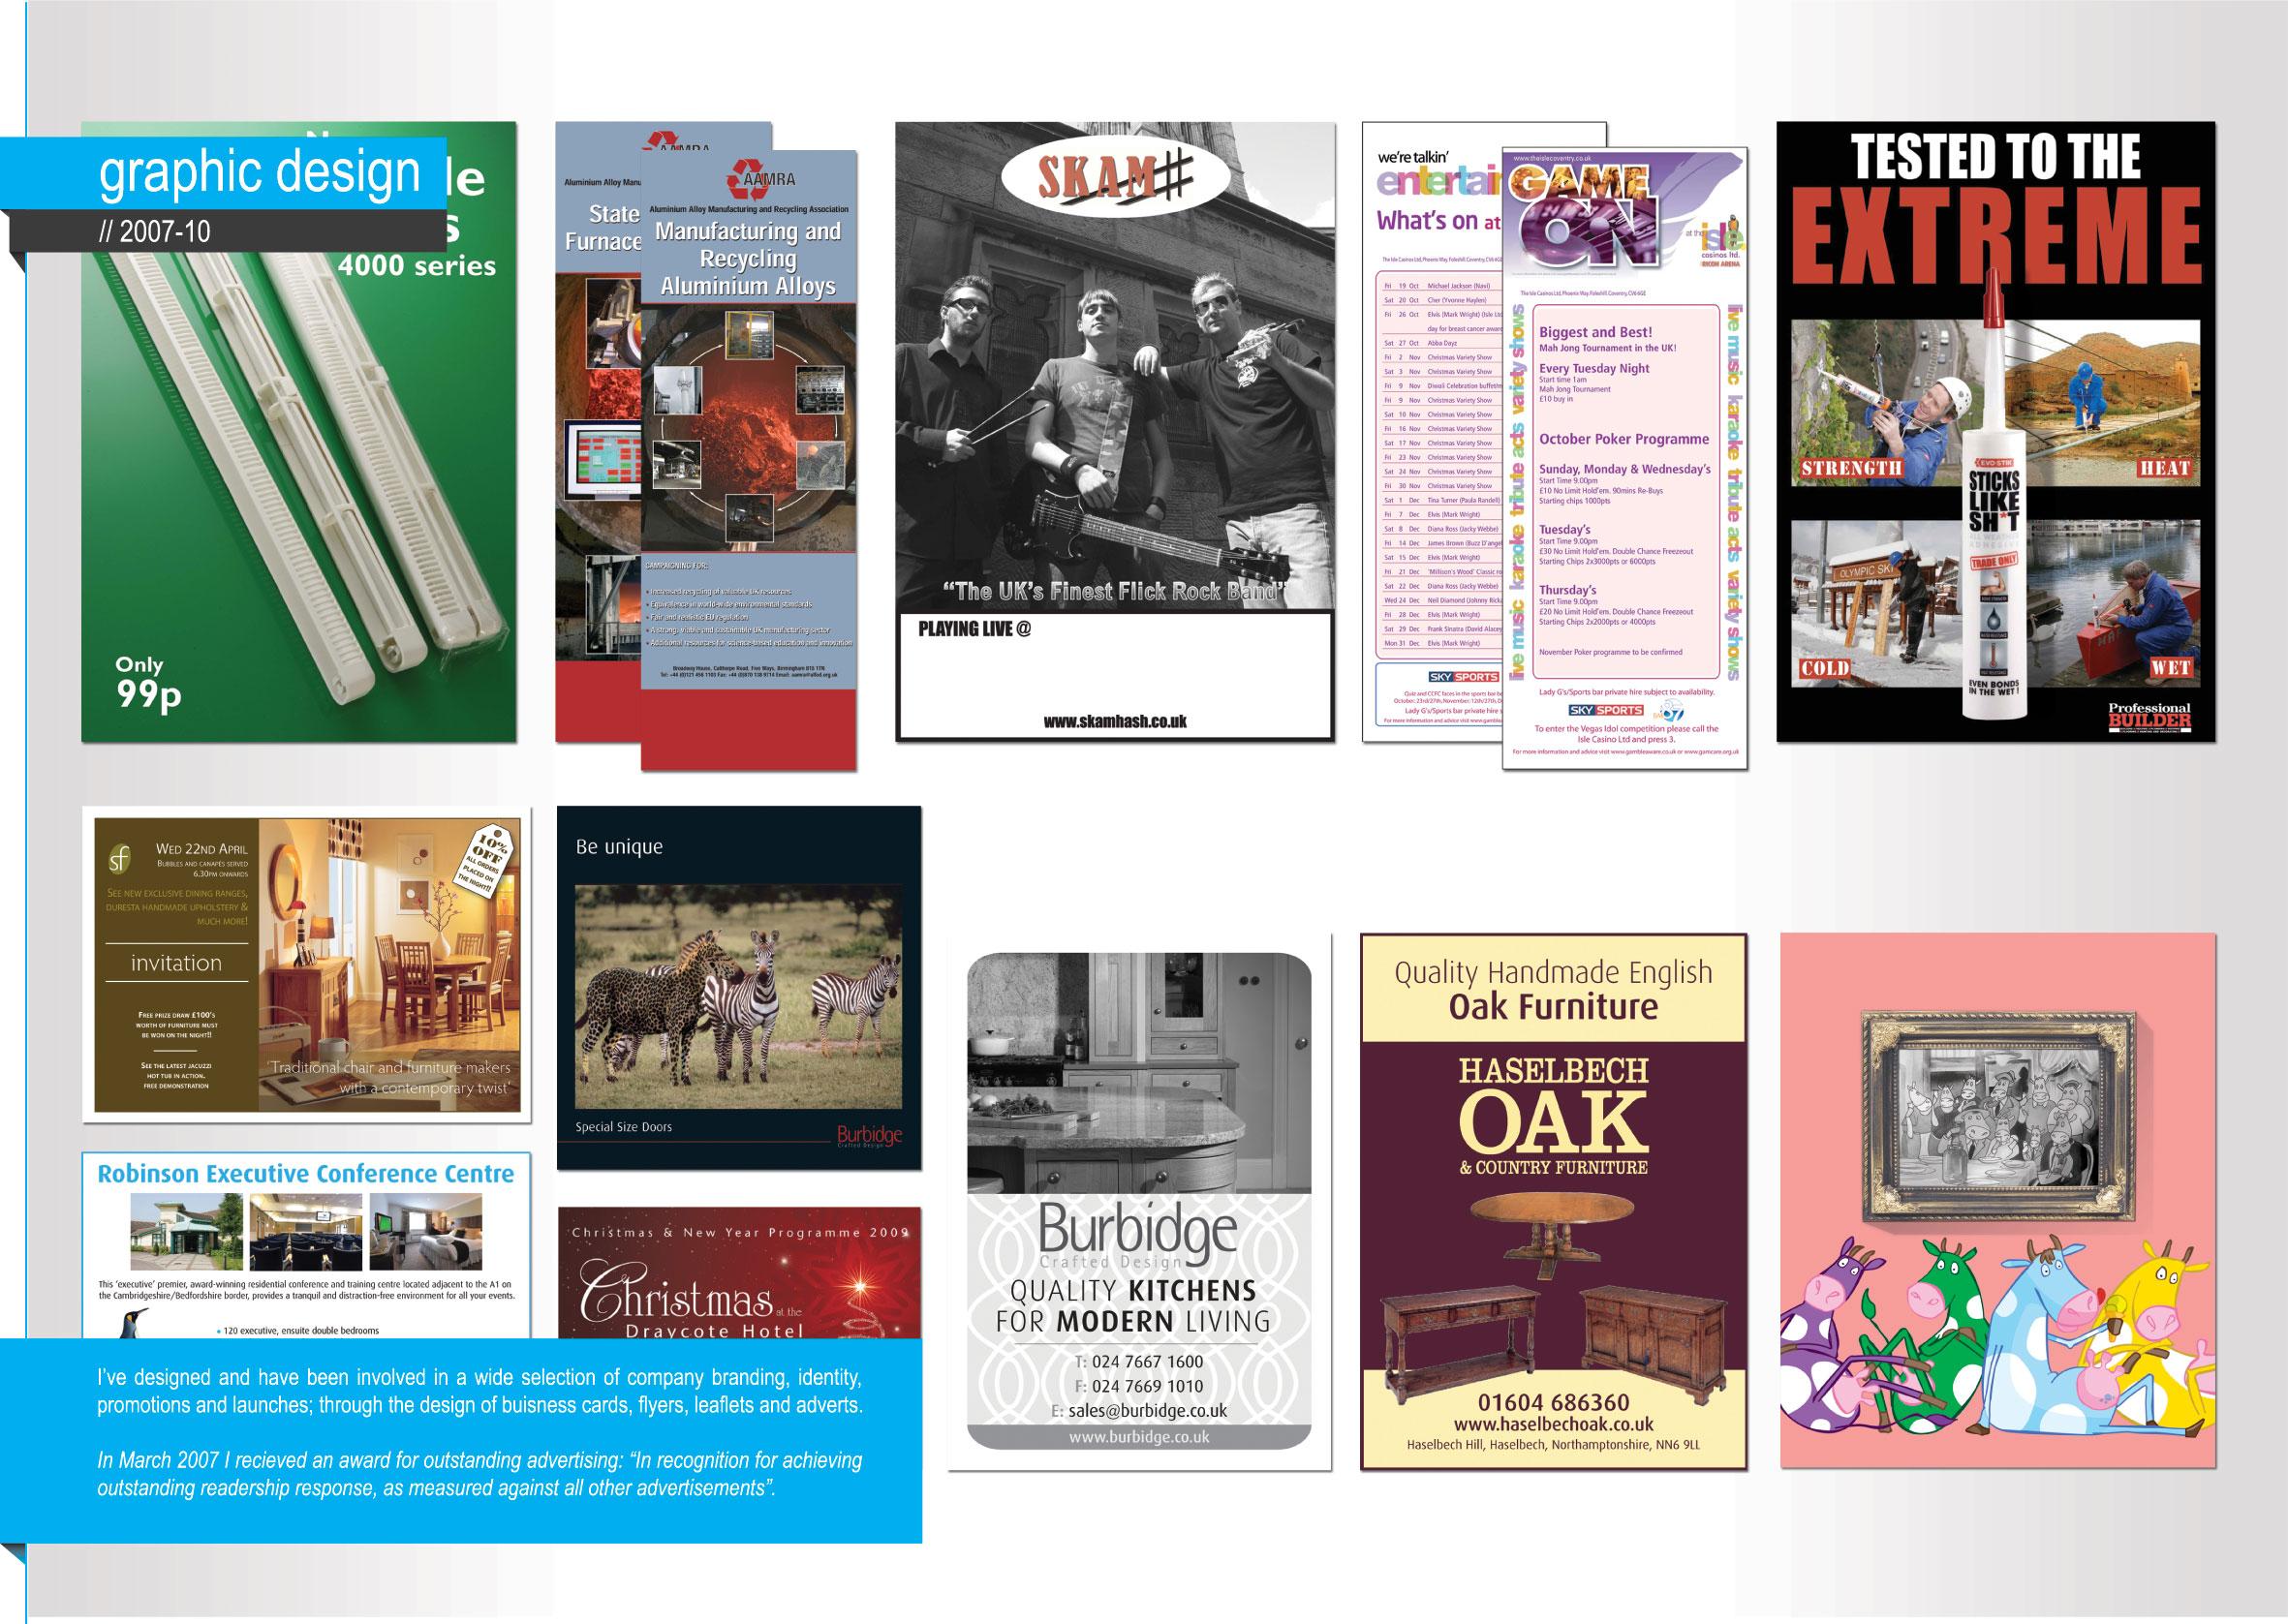 interior design portfolio examples pdf billingsblessingbagsorg - Design Portfolio Ideas